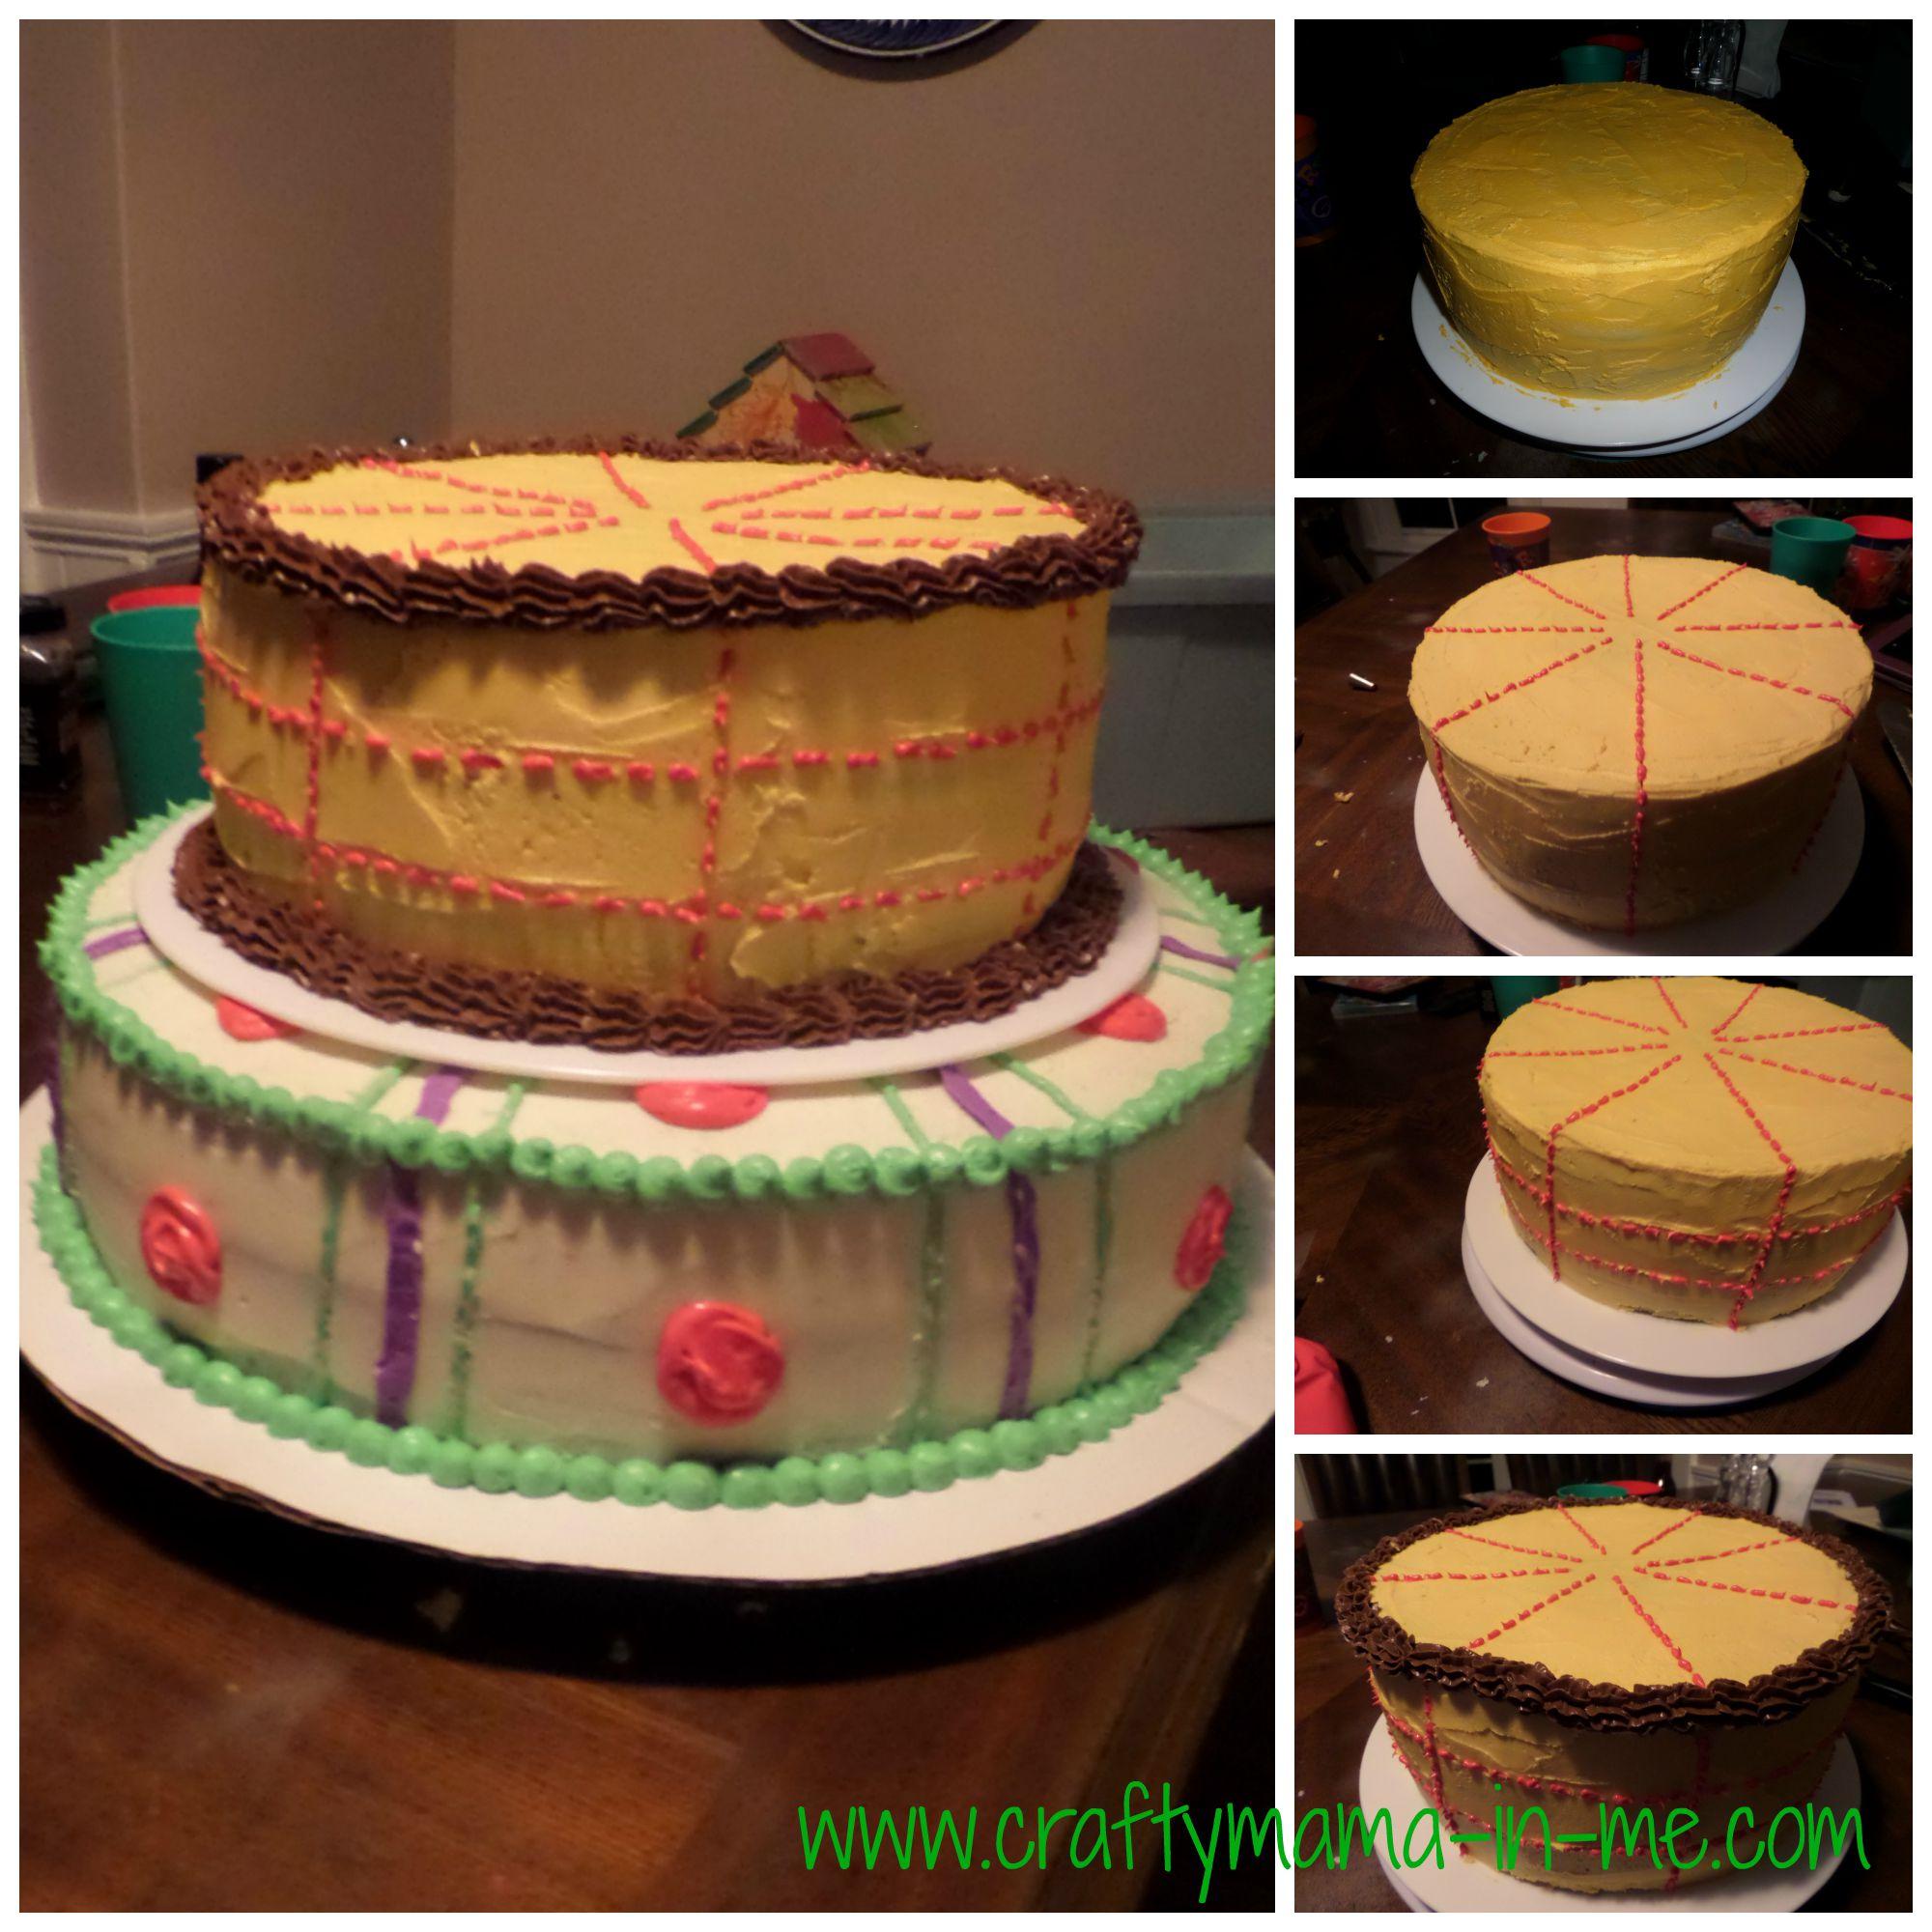 Marvelous Toy Story Birthday Cake Crafty Mama In Me Personalised Birthday Cards Fashionlily Jamesorg